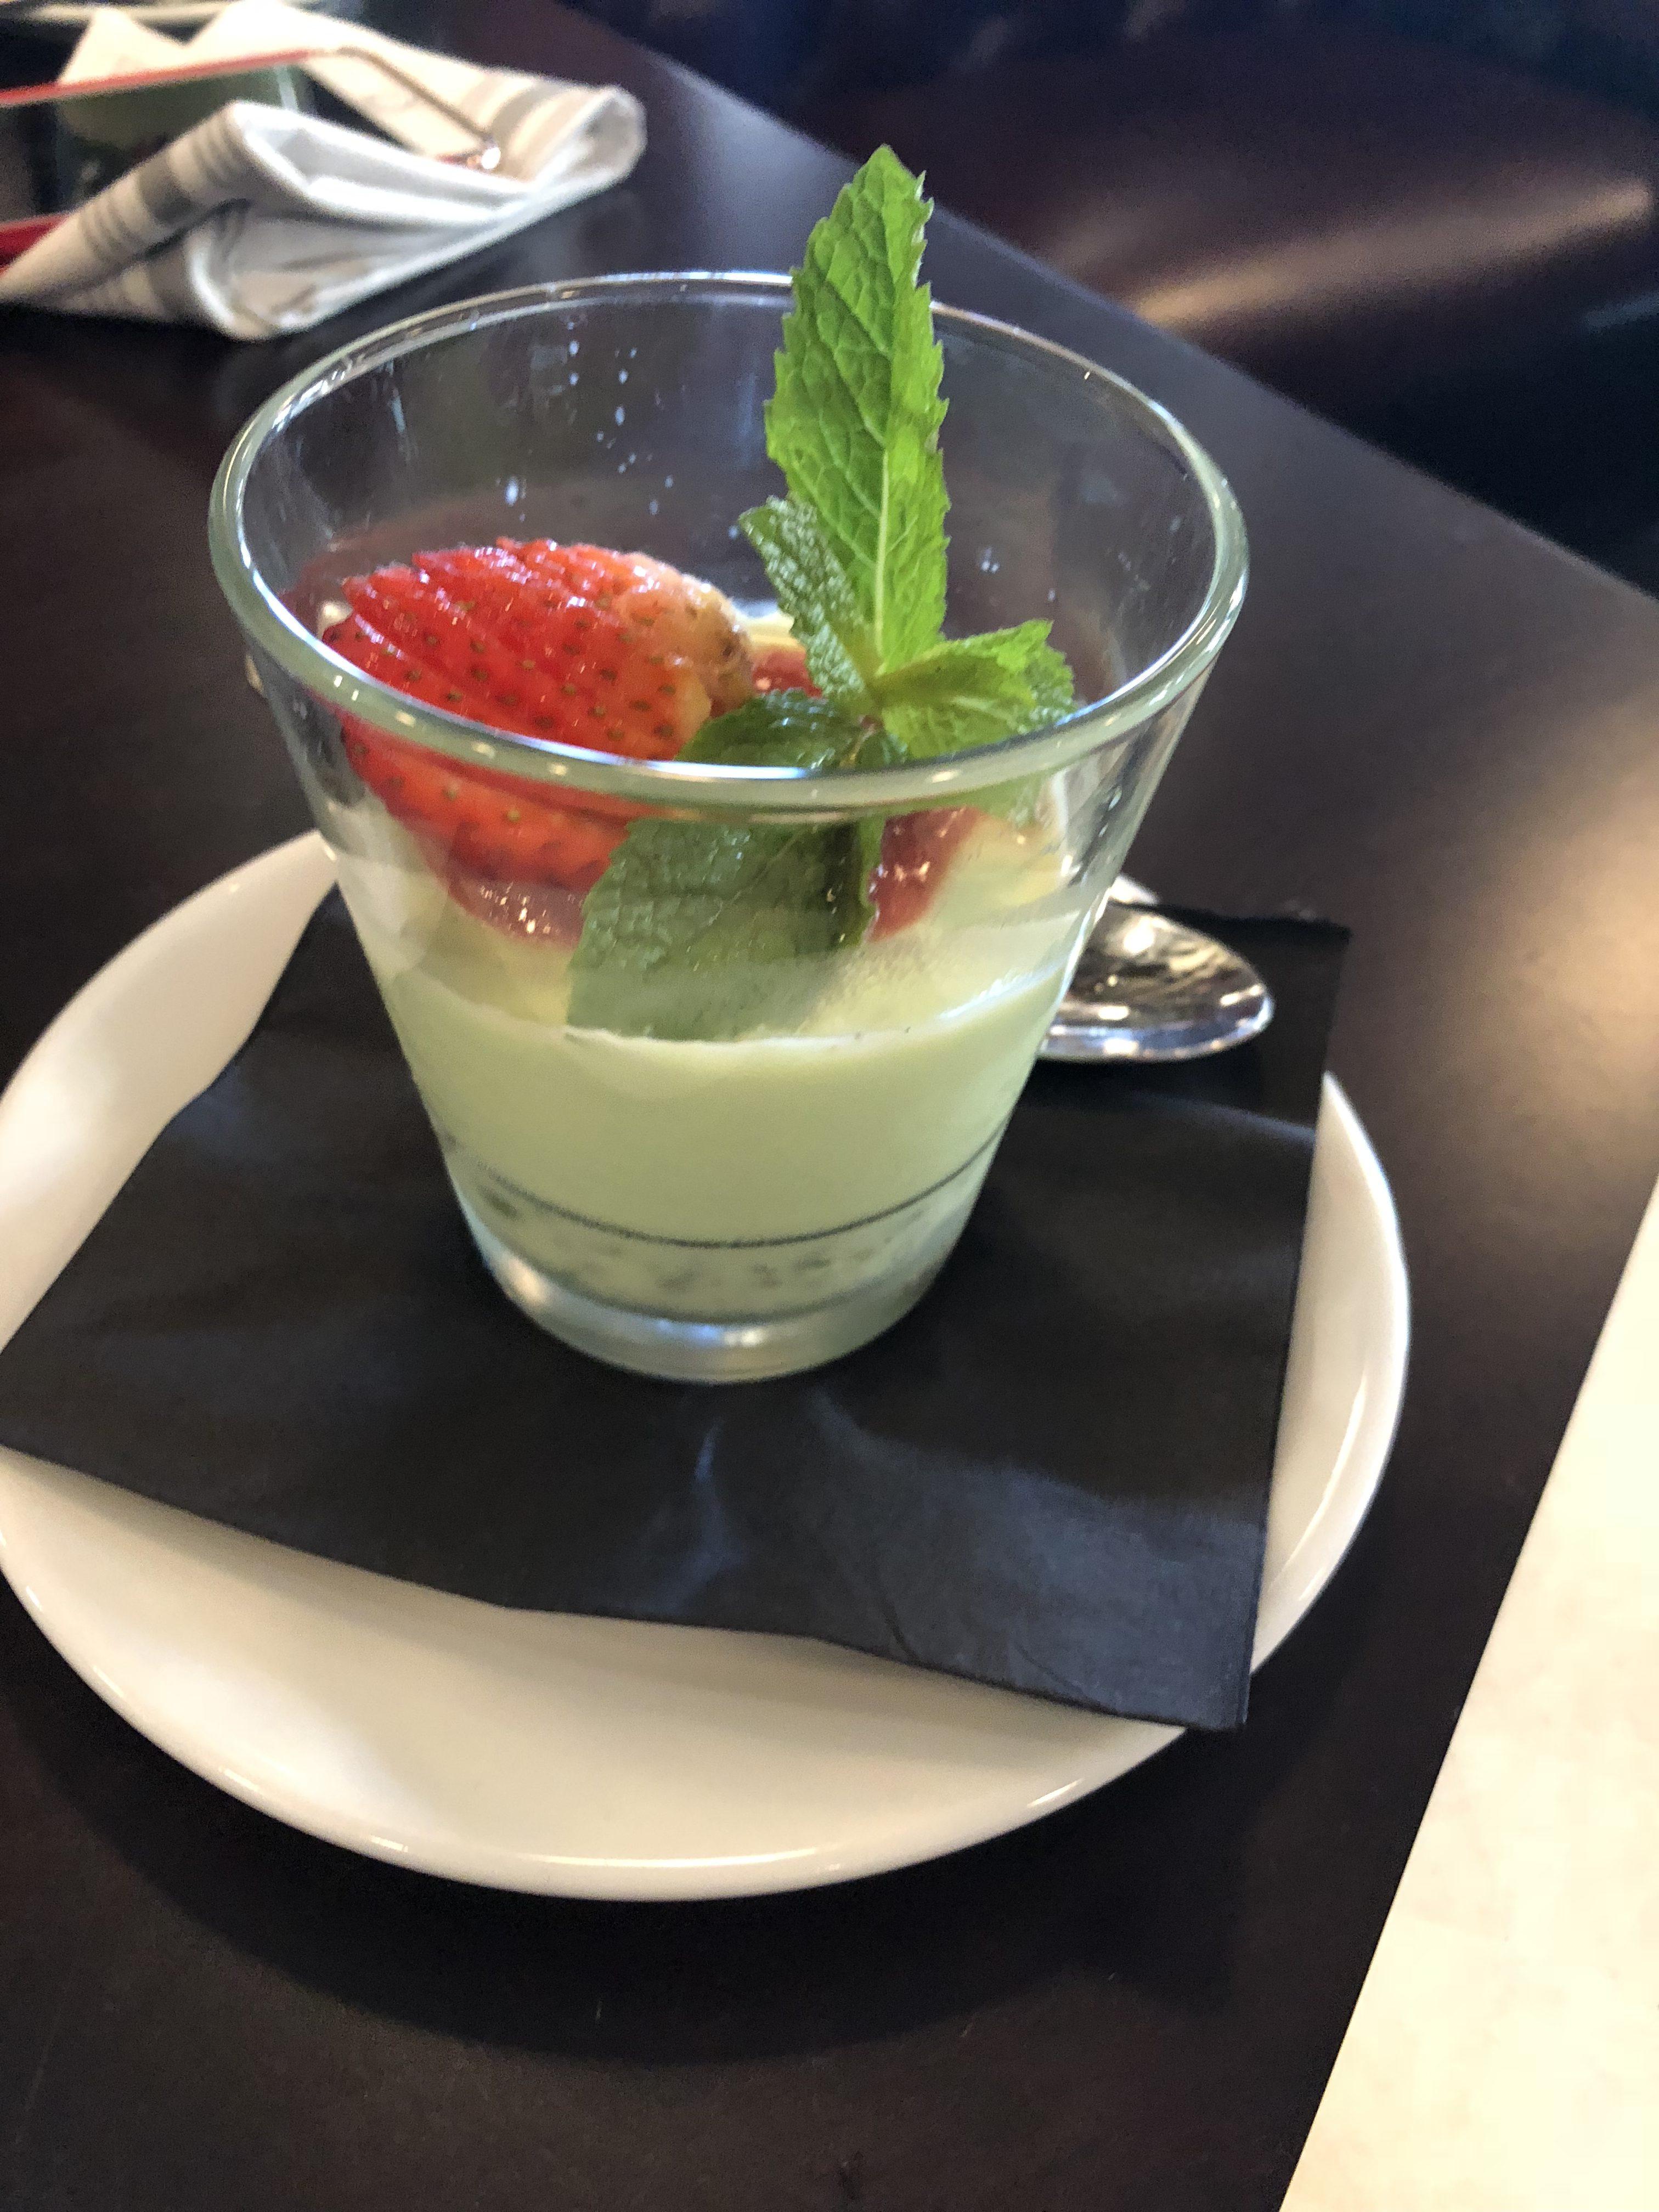 Strawberry delightful dessert by Gusto Ristobar.